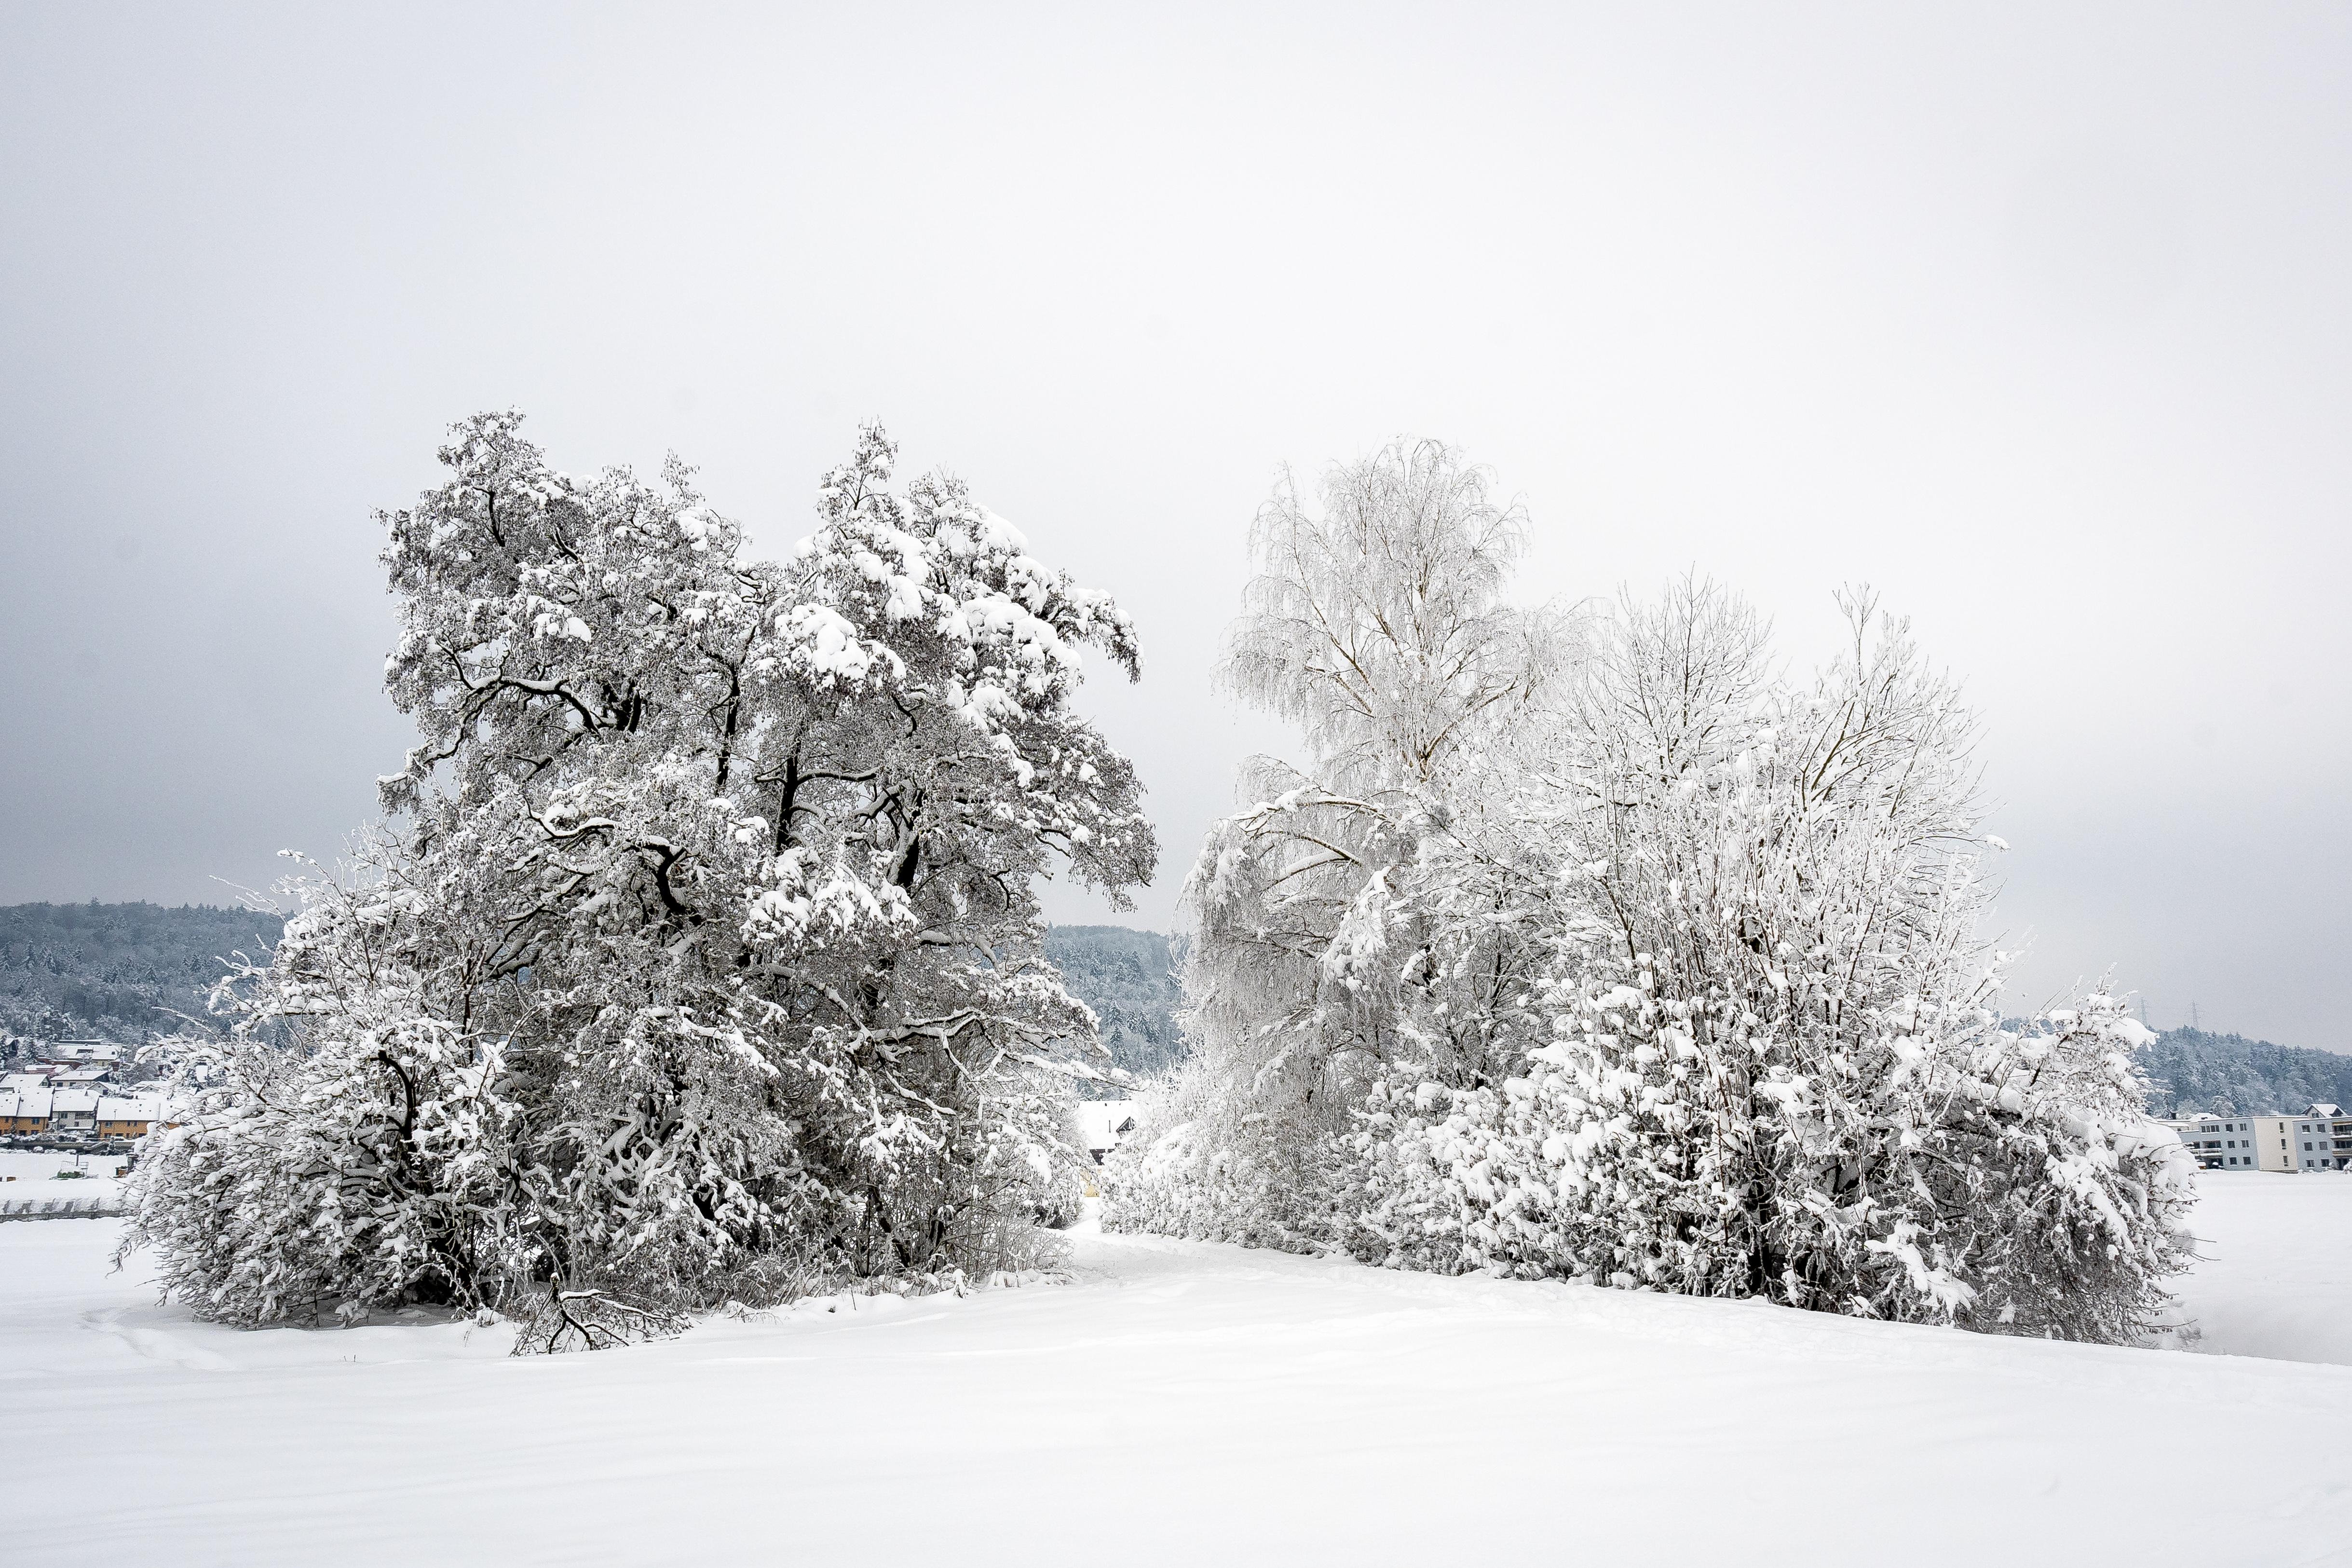 GPO im Winter 2021